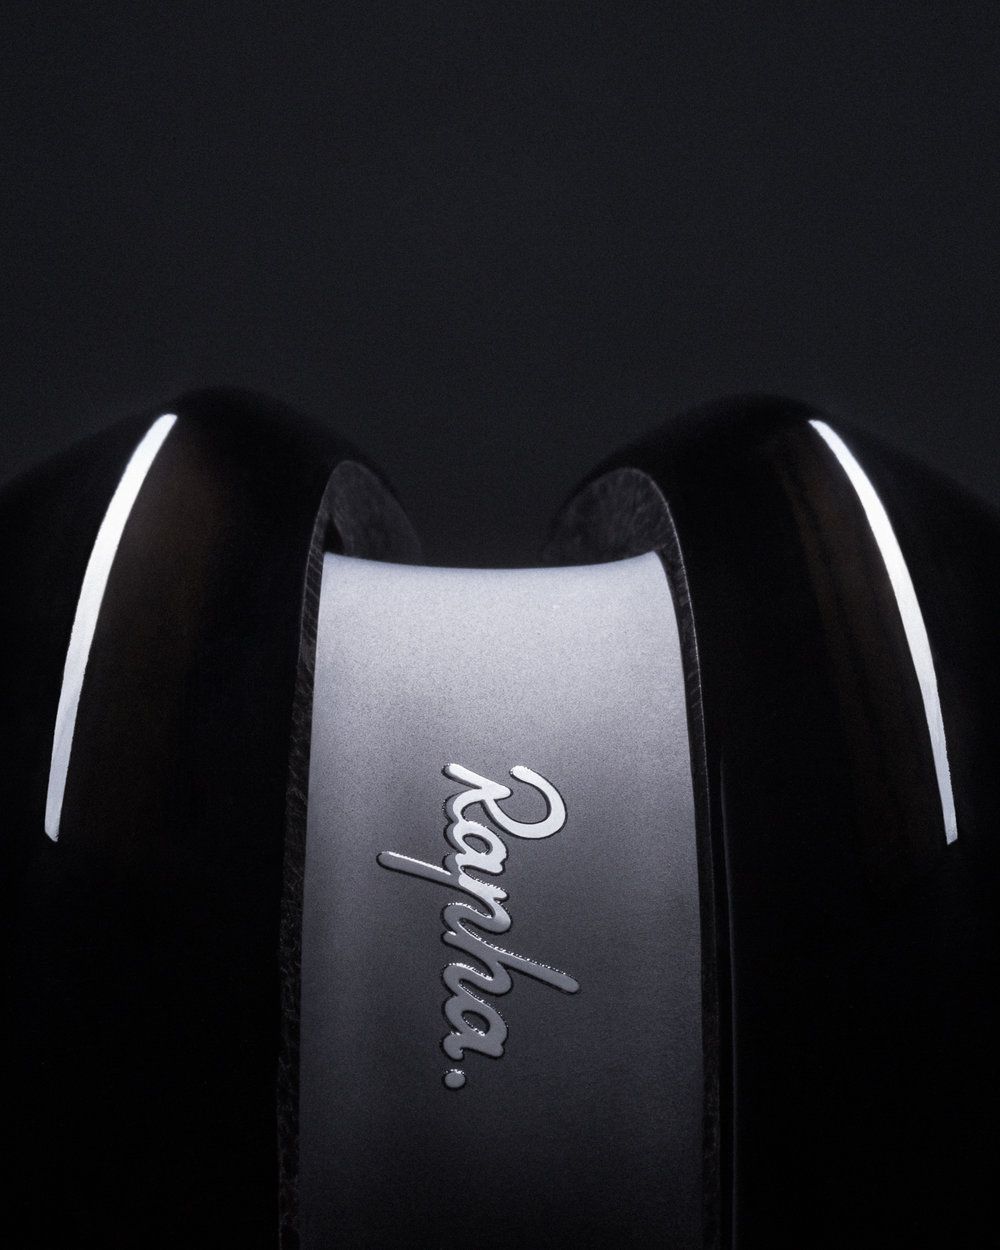 Rapha-Helmet-4345-2.jpg